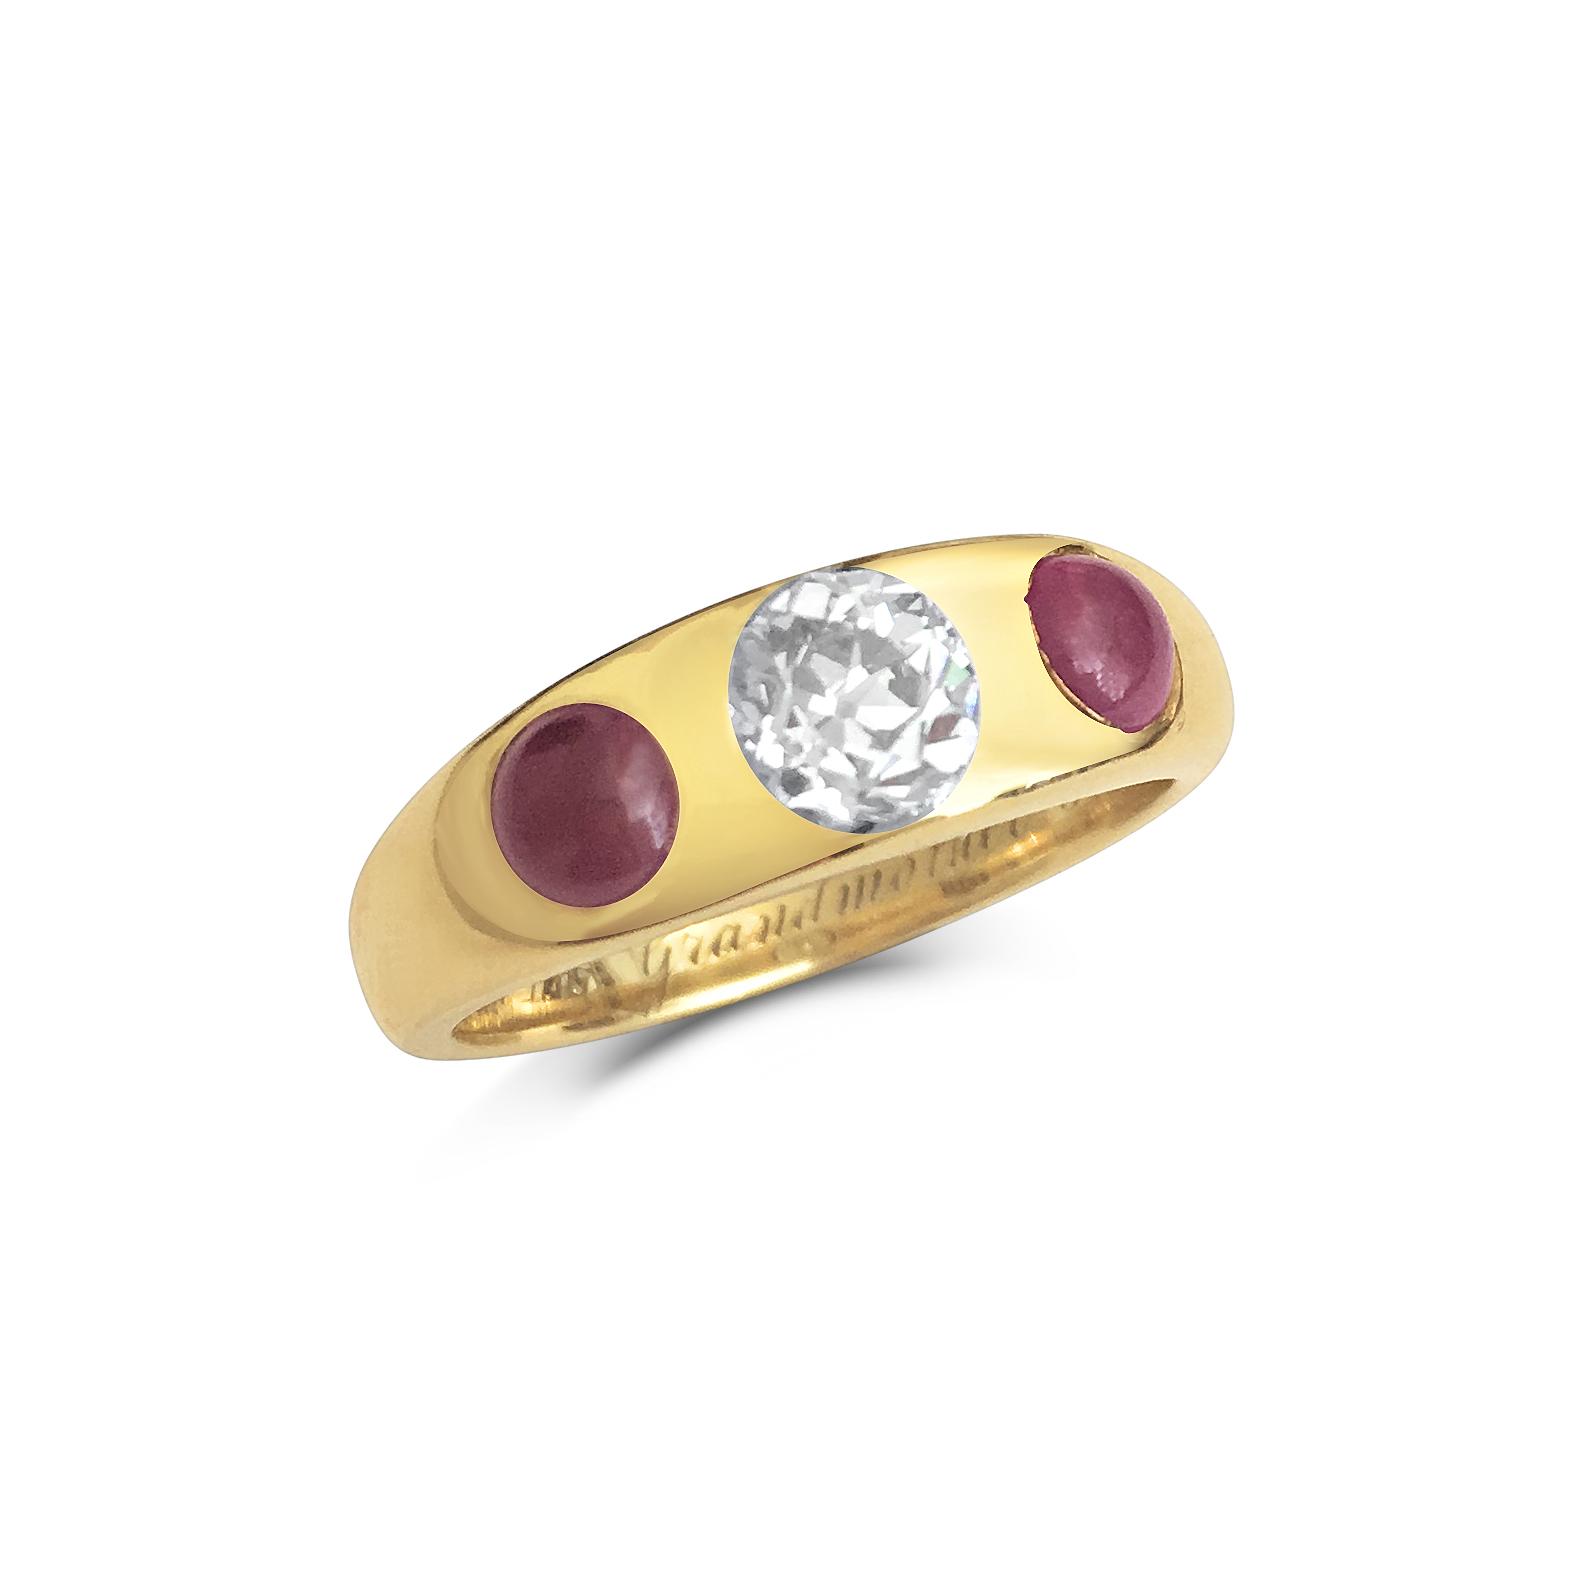 Antique diamond & ruby three-stone gypsy ring